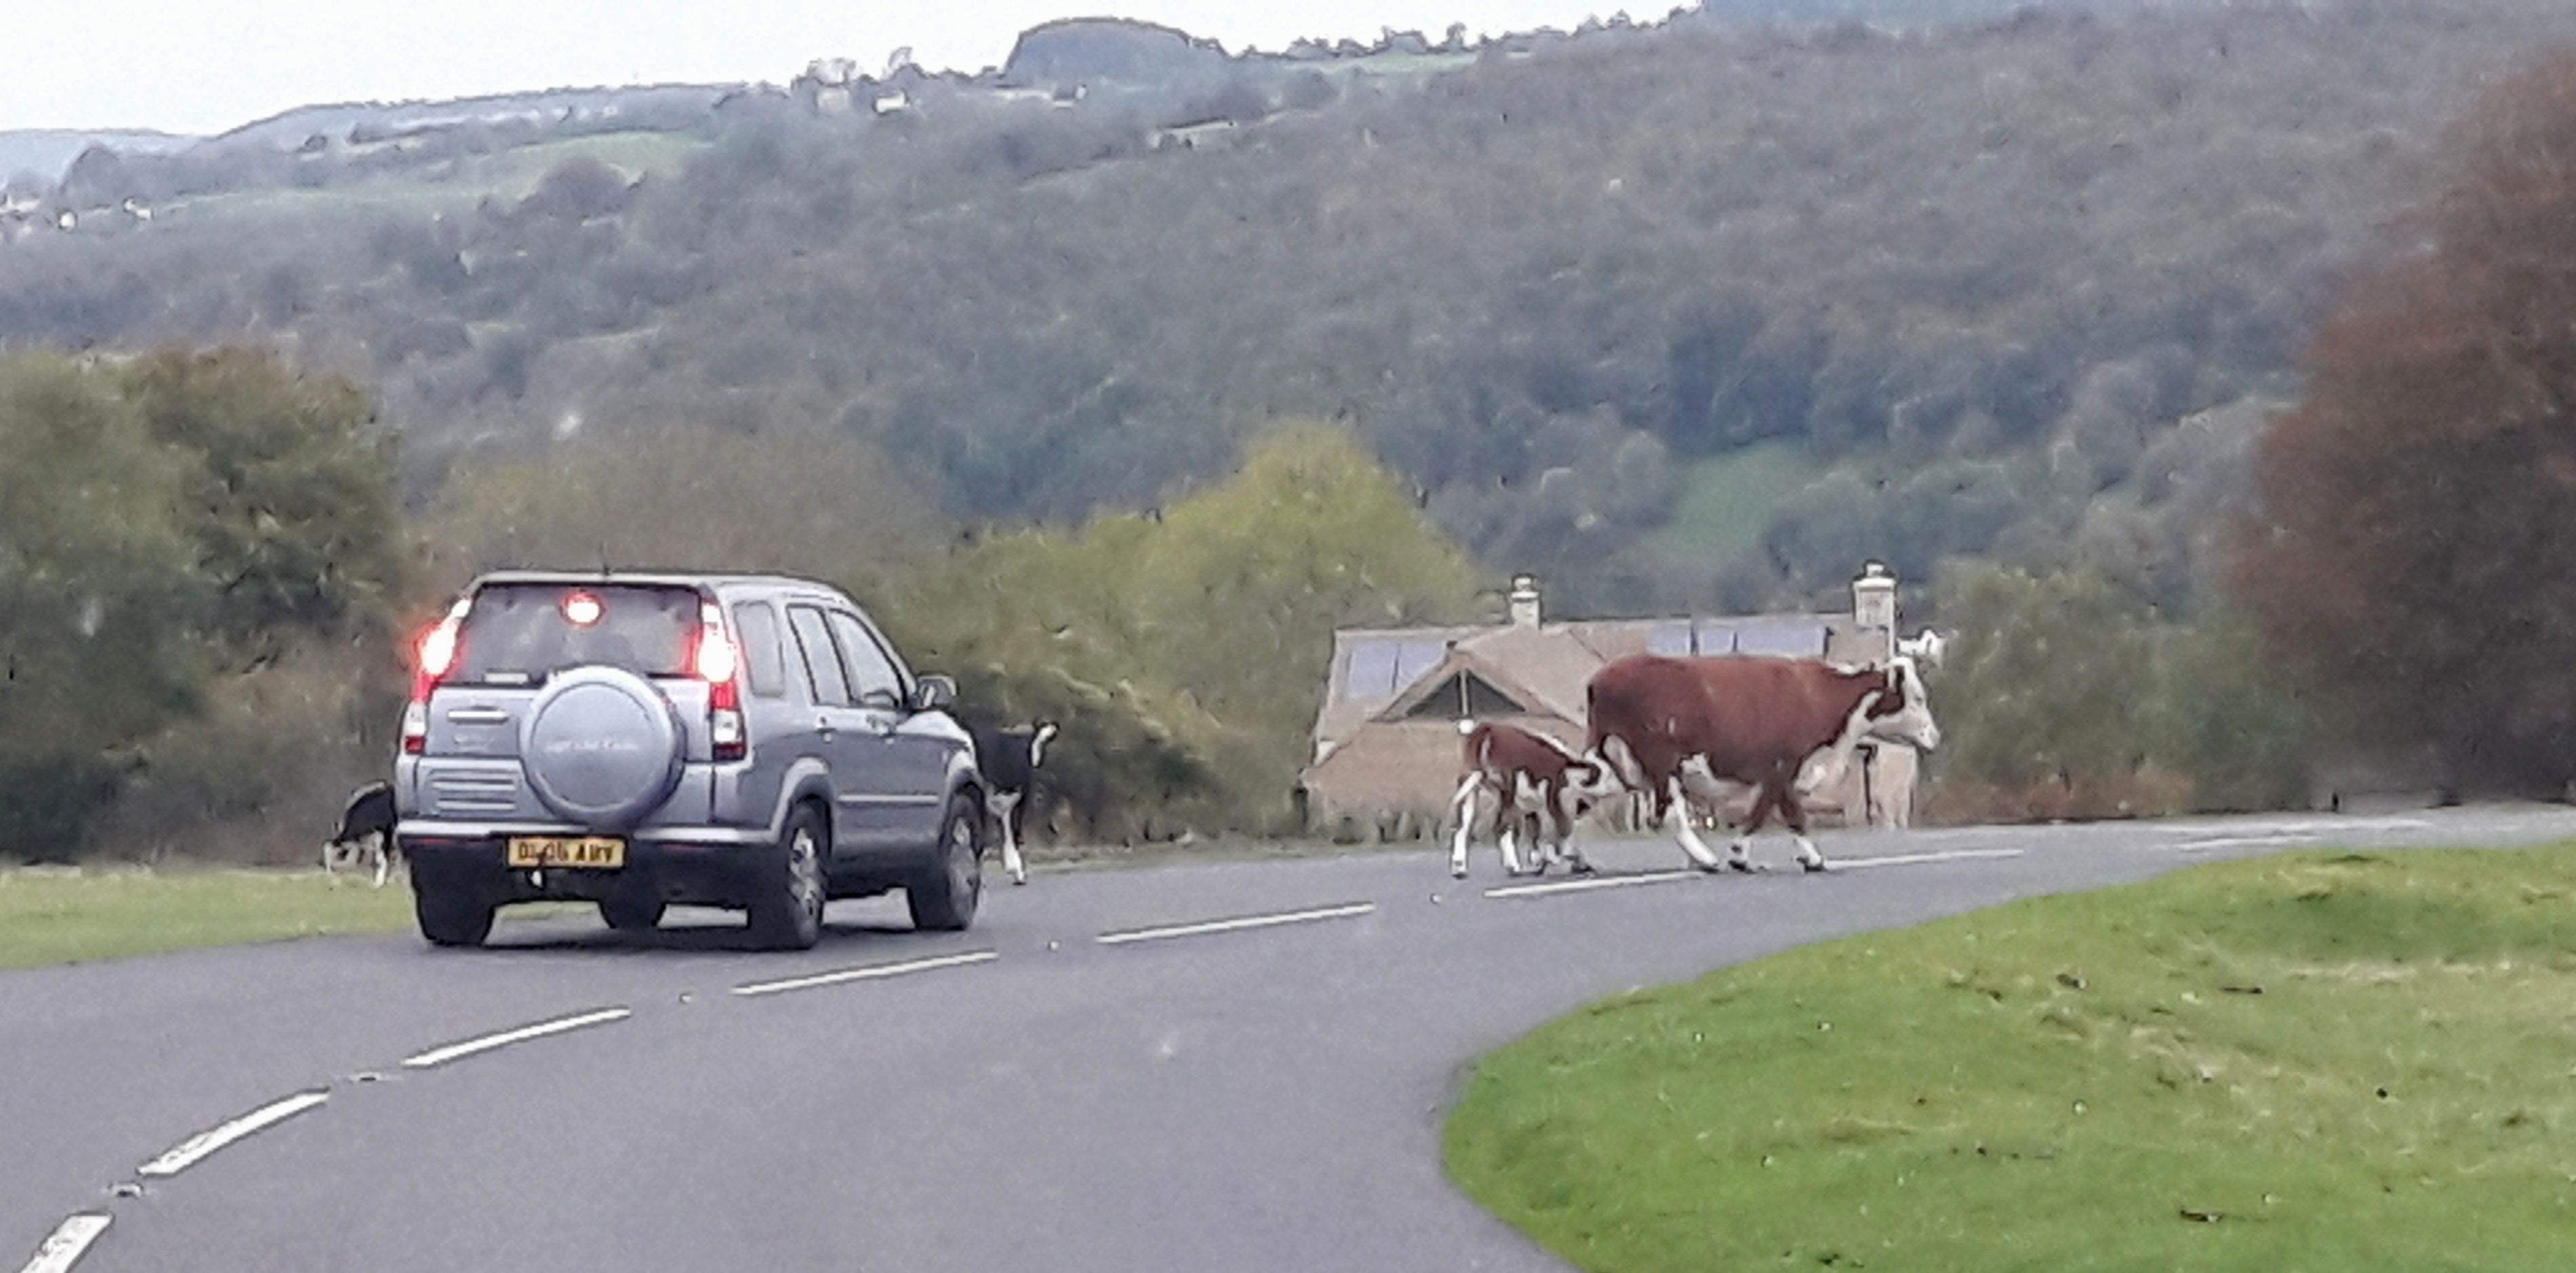 Cows roaming free on beautiful Minchinhampton Common